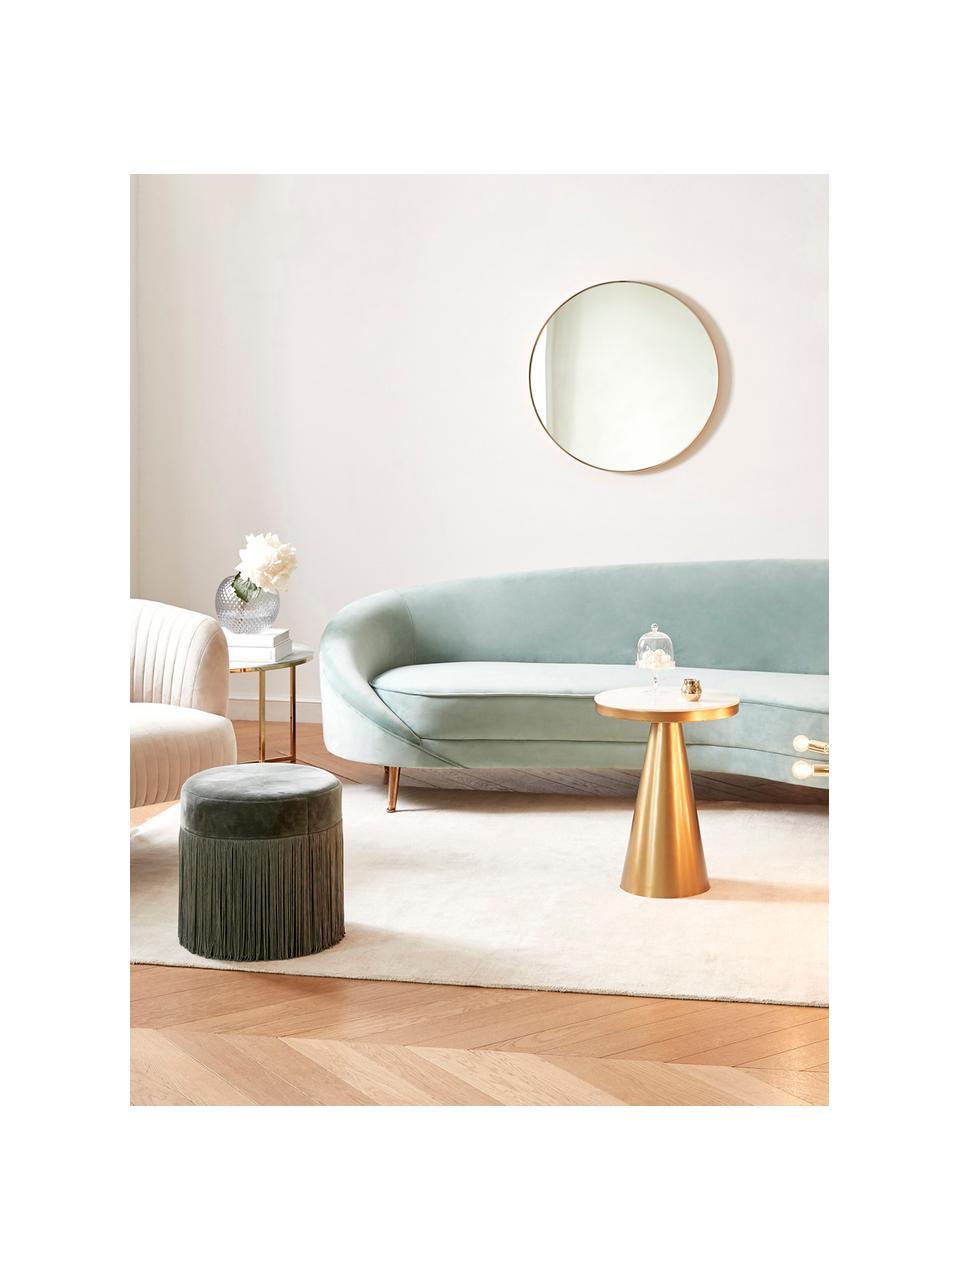 Fluwelen bank Gatsby (3-zits) in turquoise, Bekleding: fluweel (polyester), Frame: massief eucalyptushout, Poten: gegalvaniseerd metaal, Fluweel turquoise, B 245 x D 102 cm